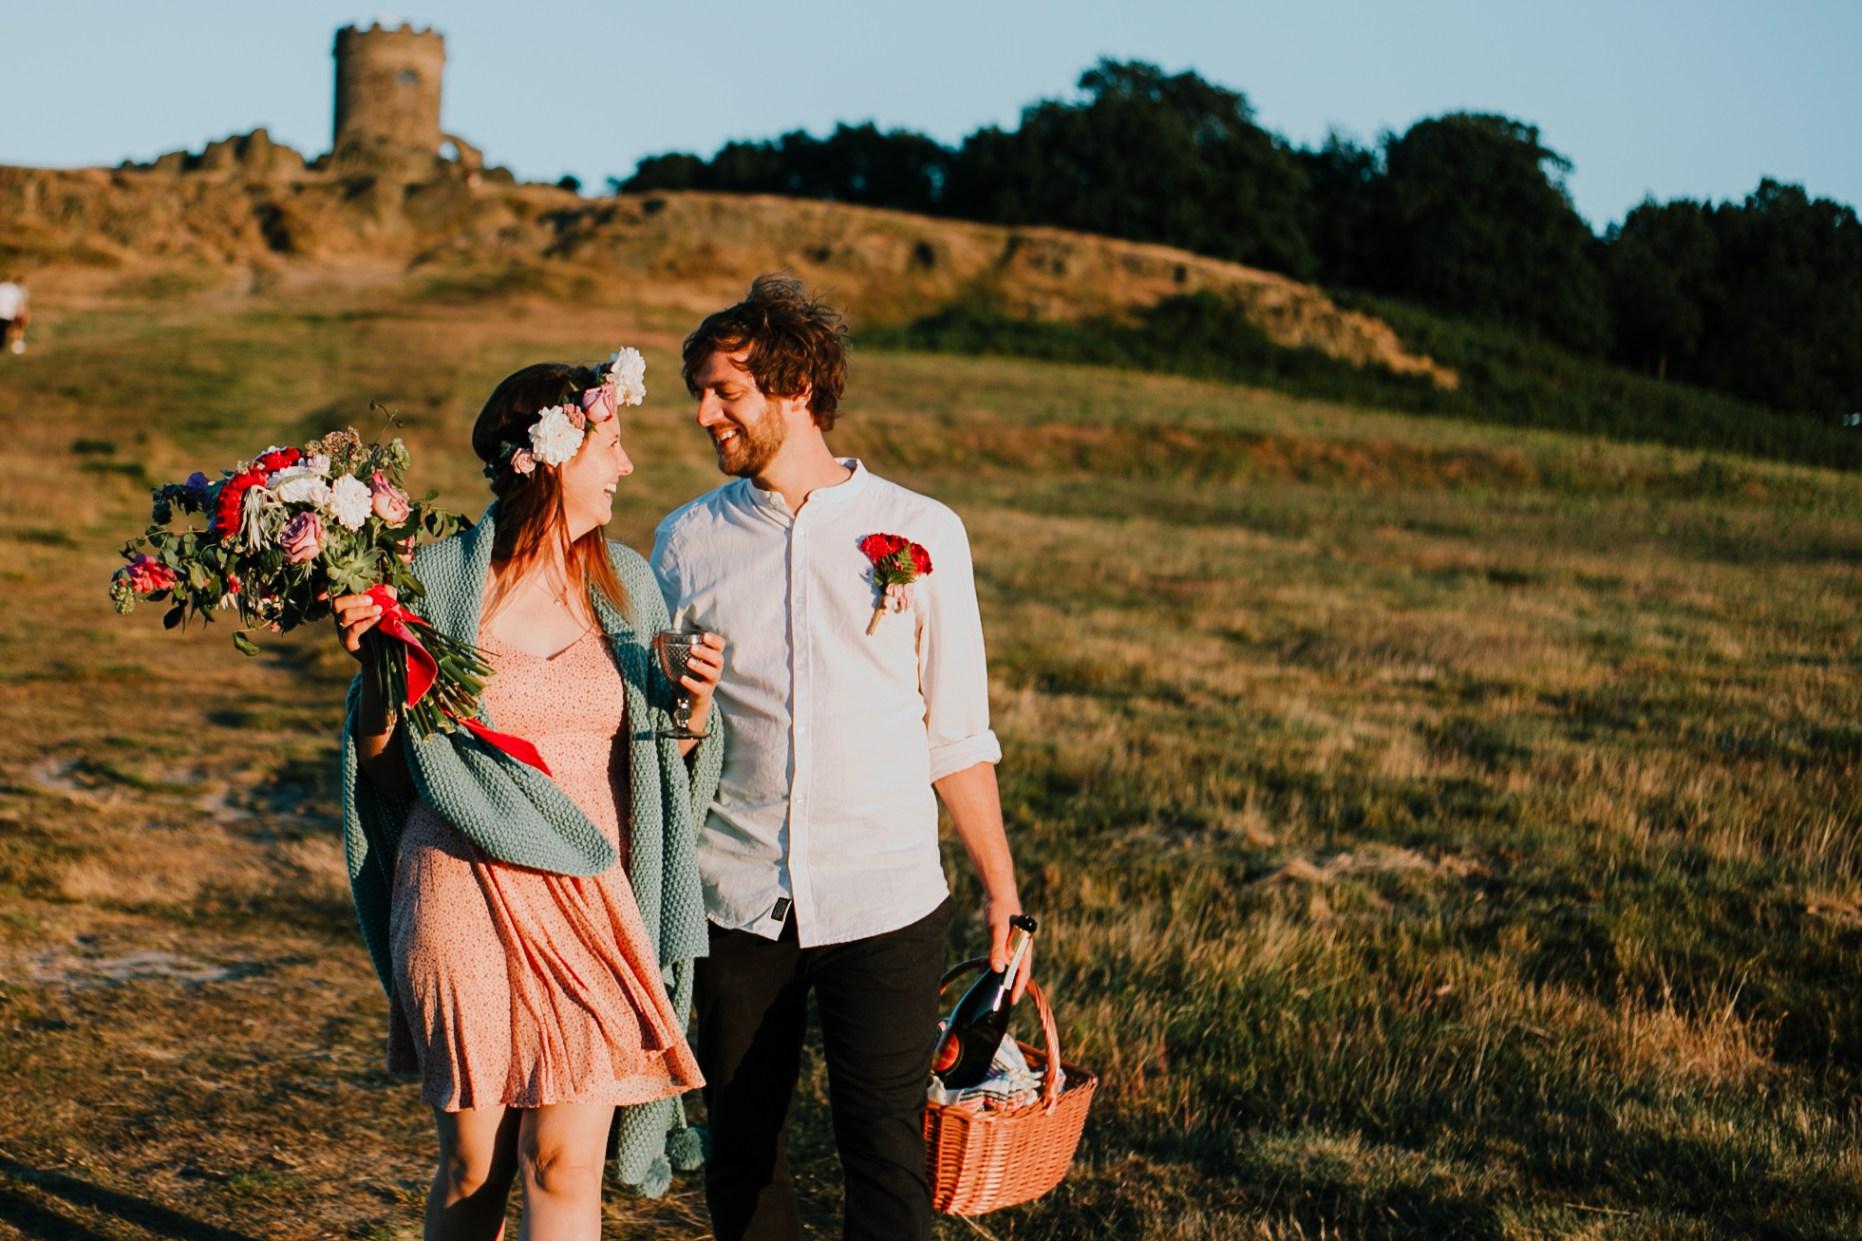 Caroline Goosey - alternative wedding photography - engagement shoot 16